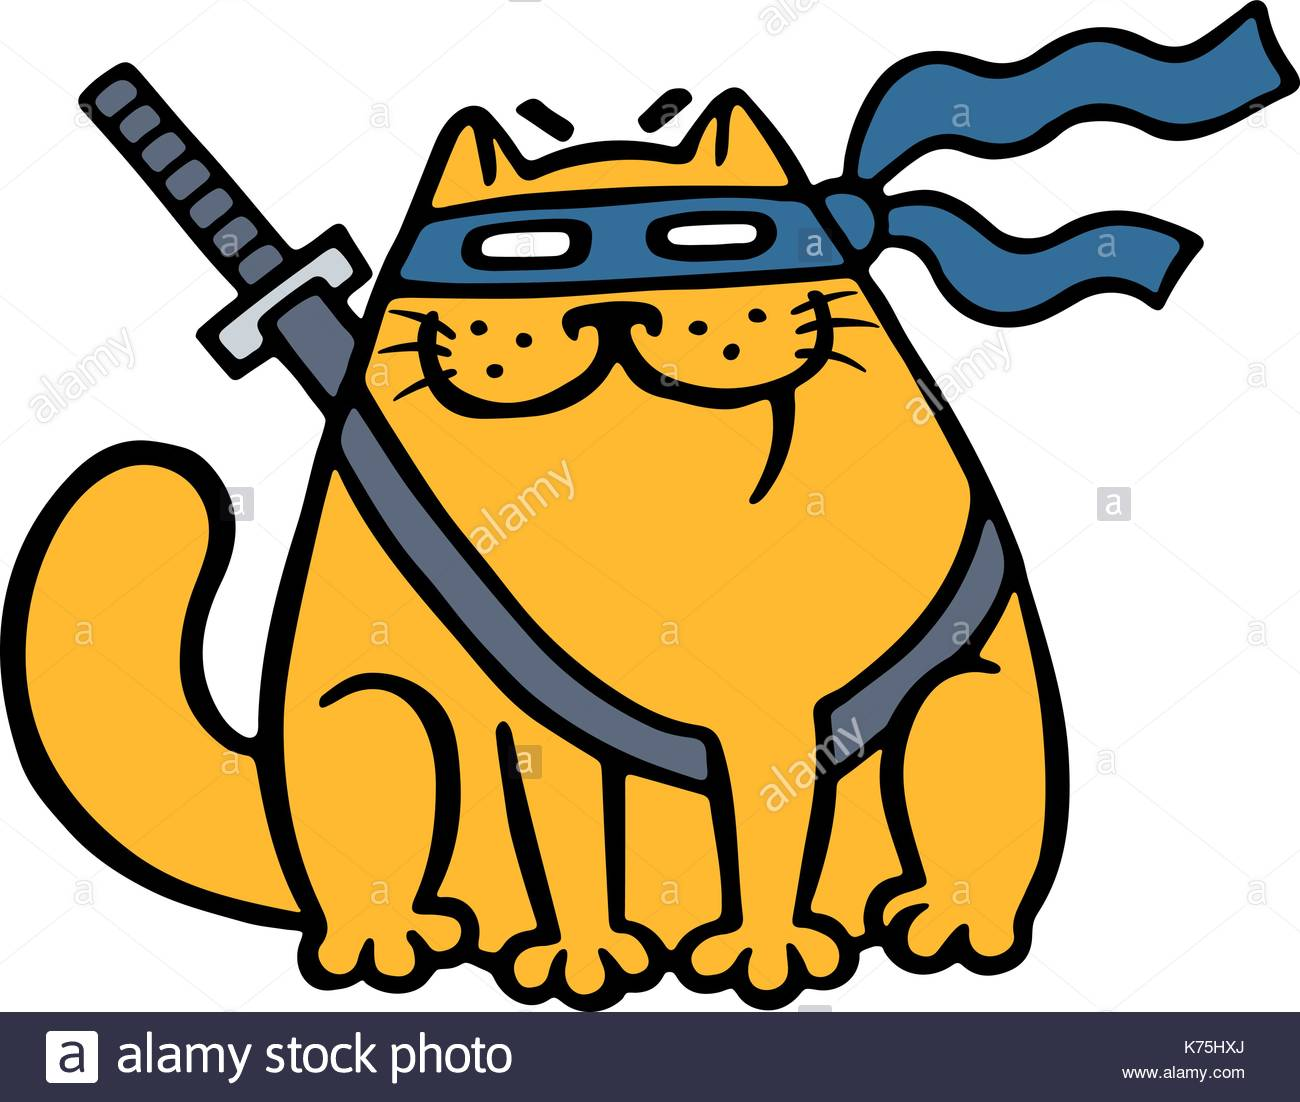 1300x1102 Cute Fat Ninja Cat In A Mask And A Sword. Funny Cartoon Cool Stock